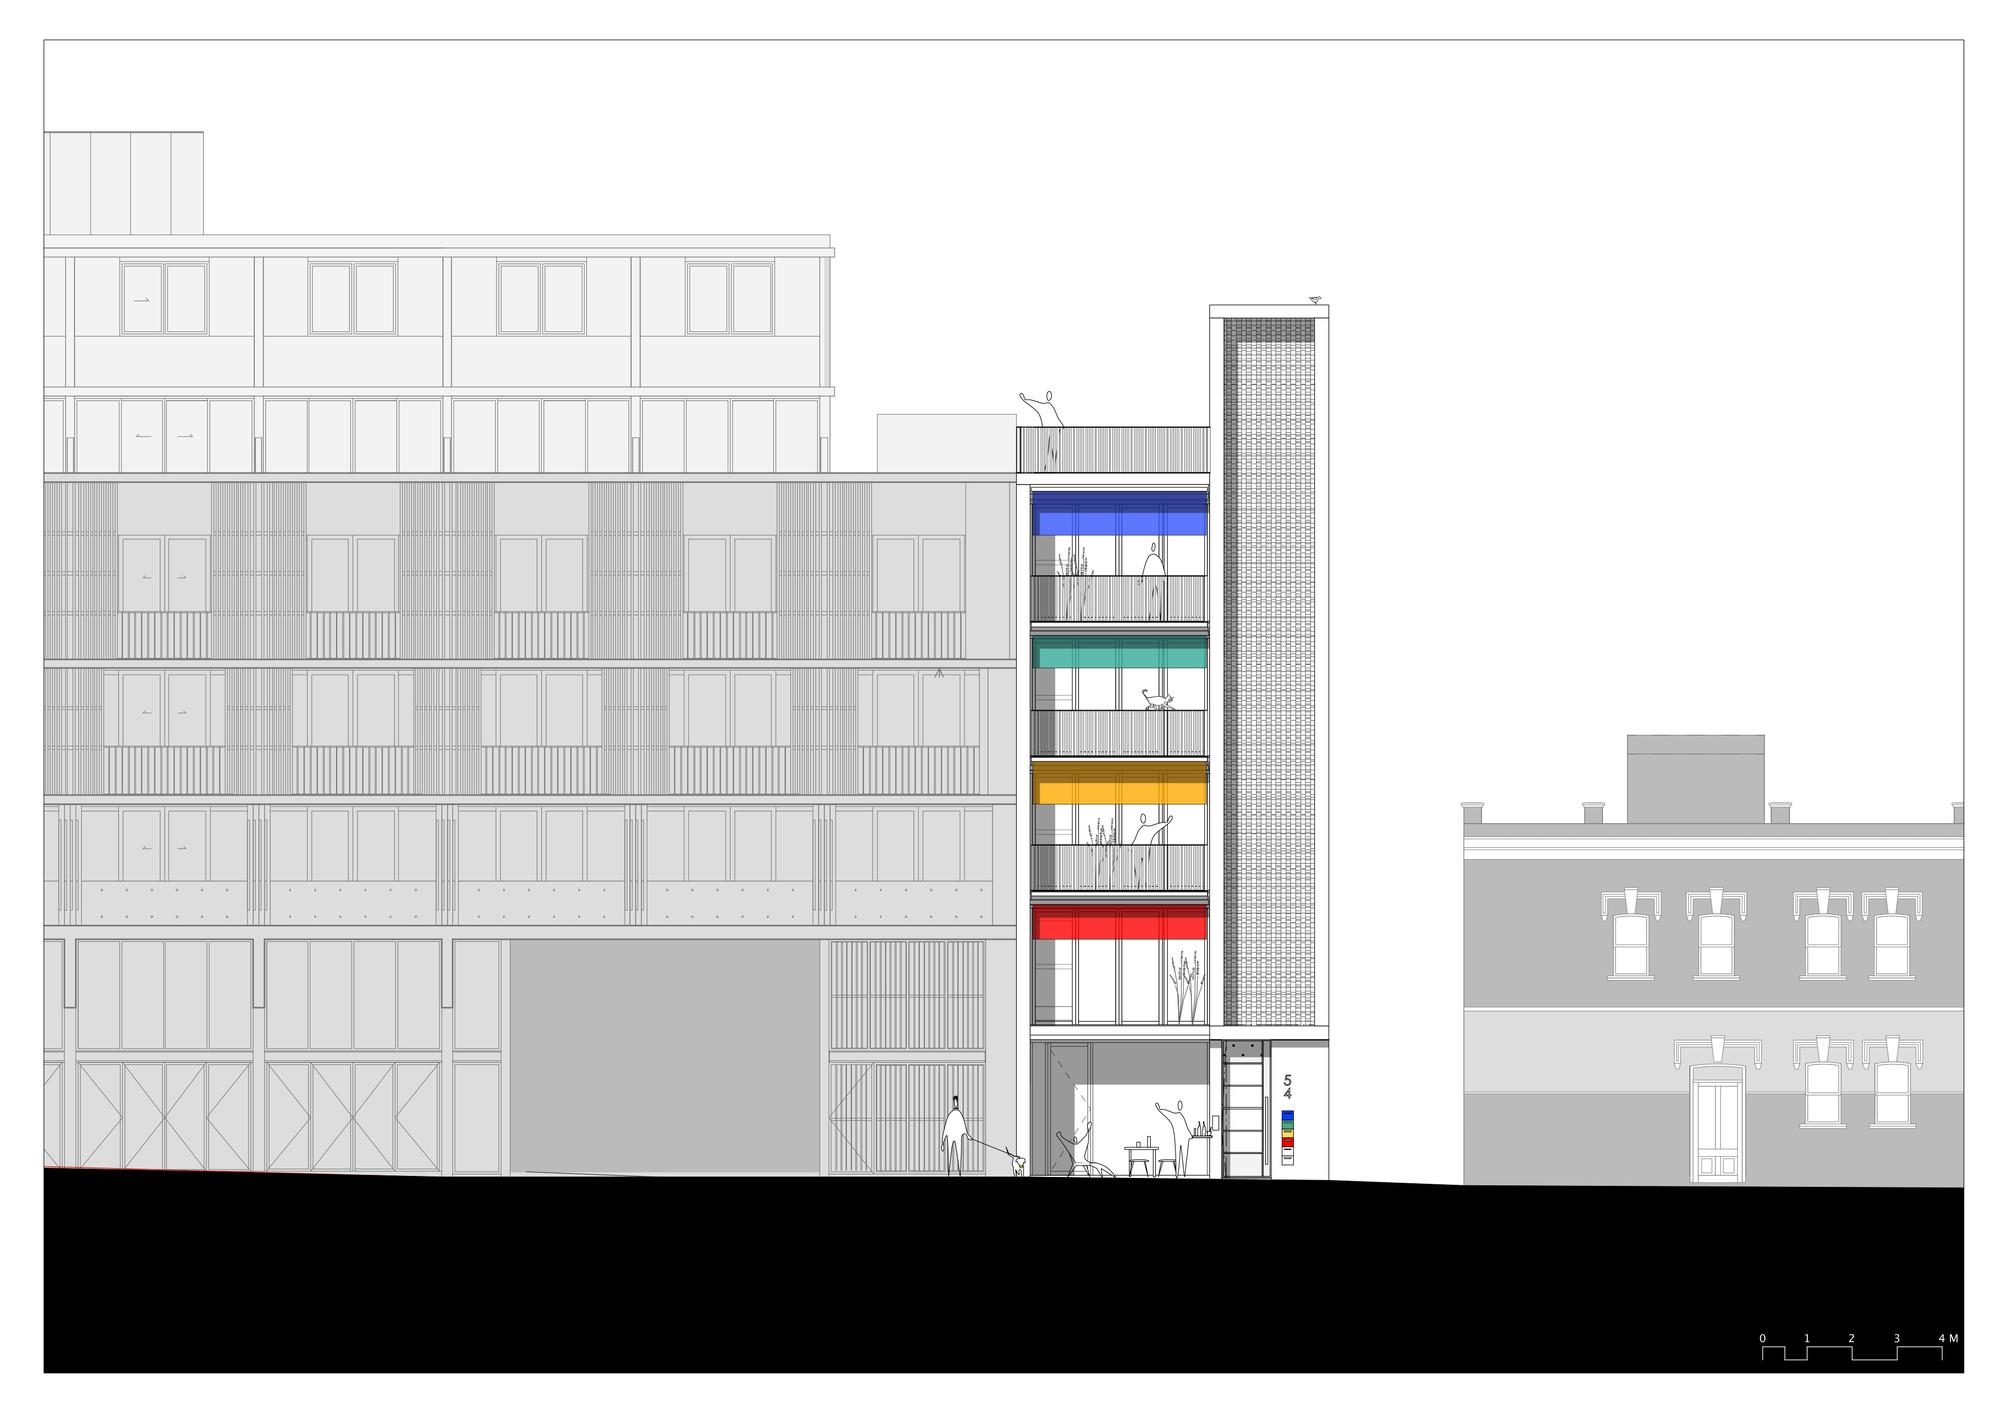 Galeria de studios 54 hill thalis architecture urban for Architecture 54